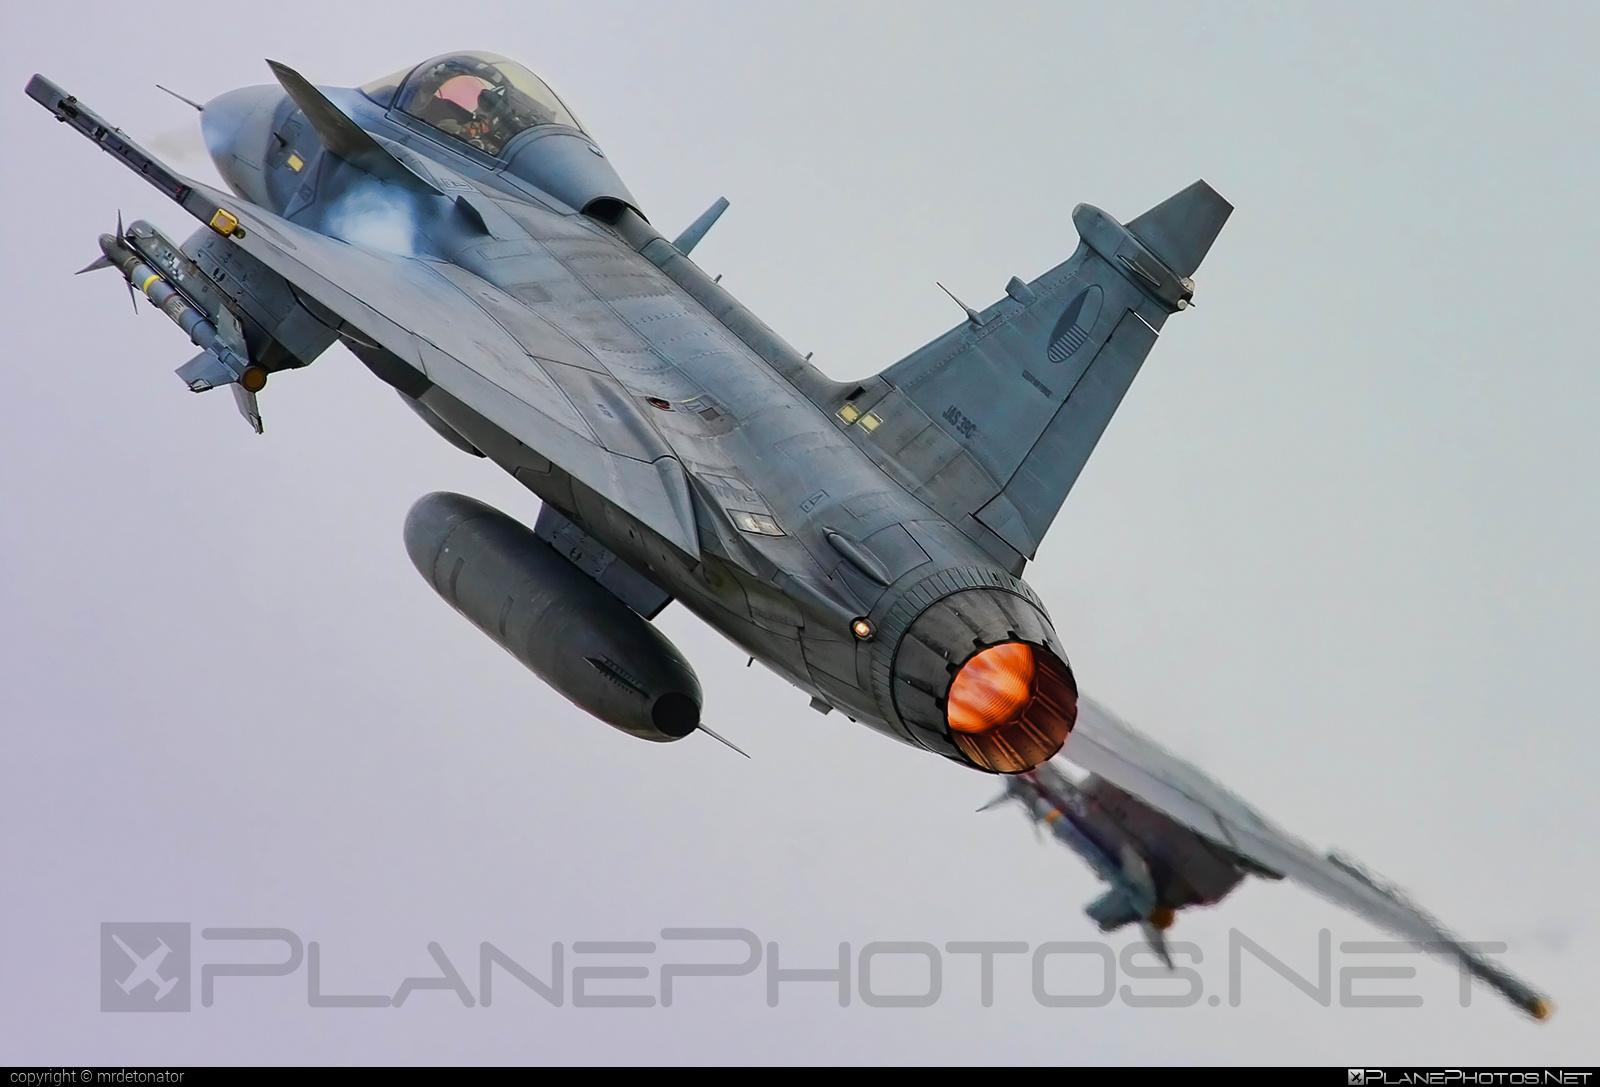 Saab JAS 39C Gripen - 9236 operated by Vzdušné síly AČR (Czech Air Force) #czechairforce #gripen #jas39 #jas39c #jas39gripen #saab #vzdusnesilyacr